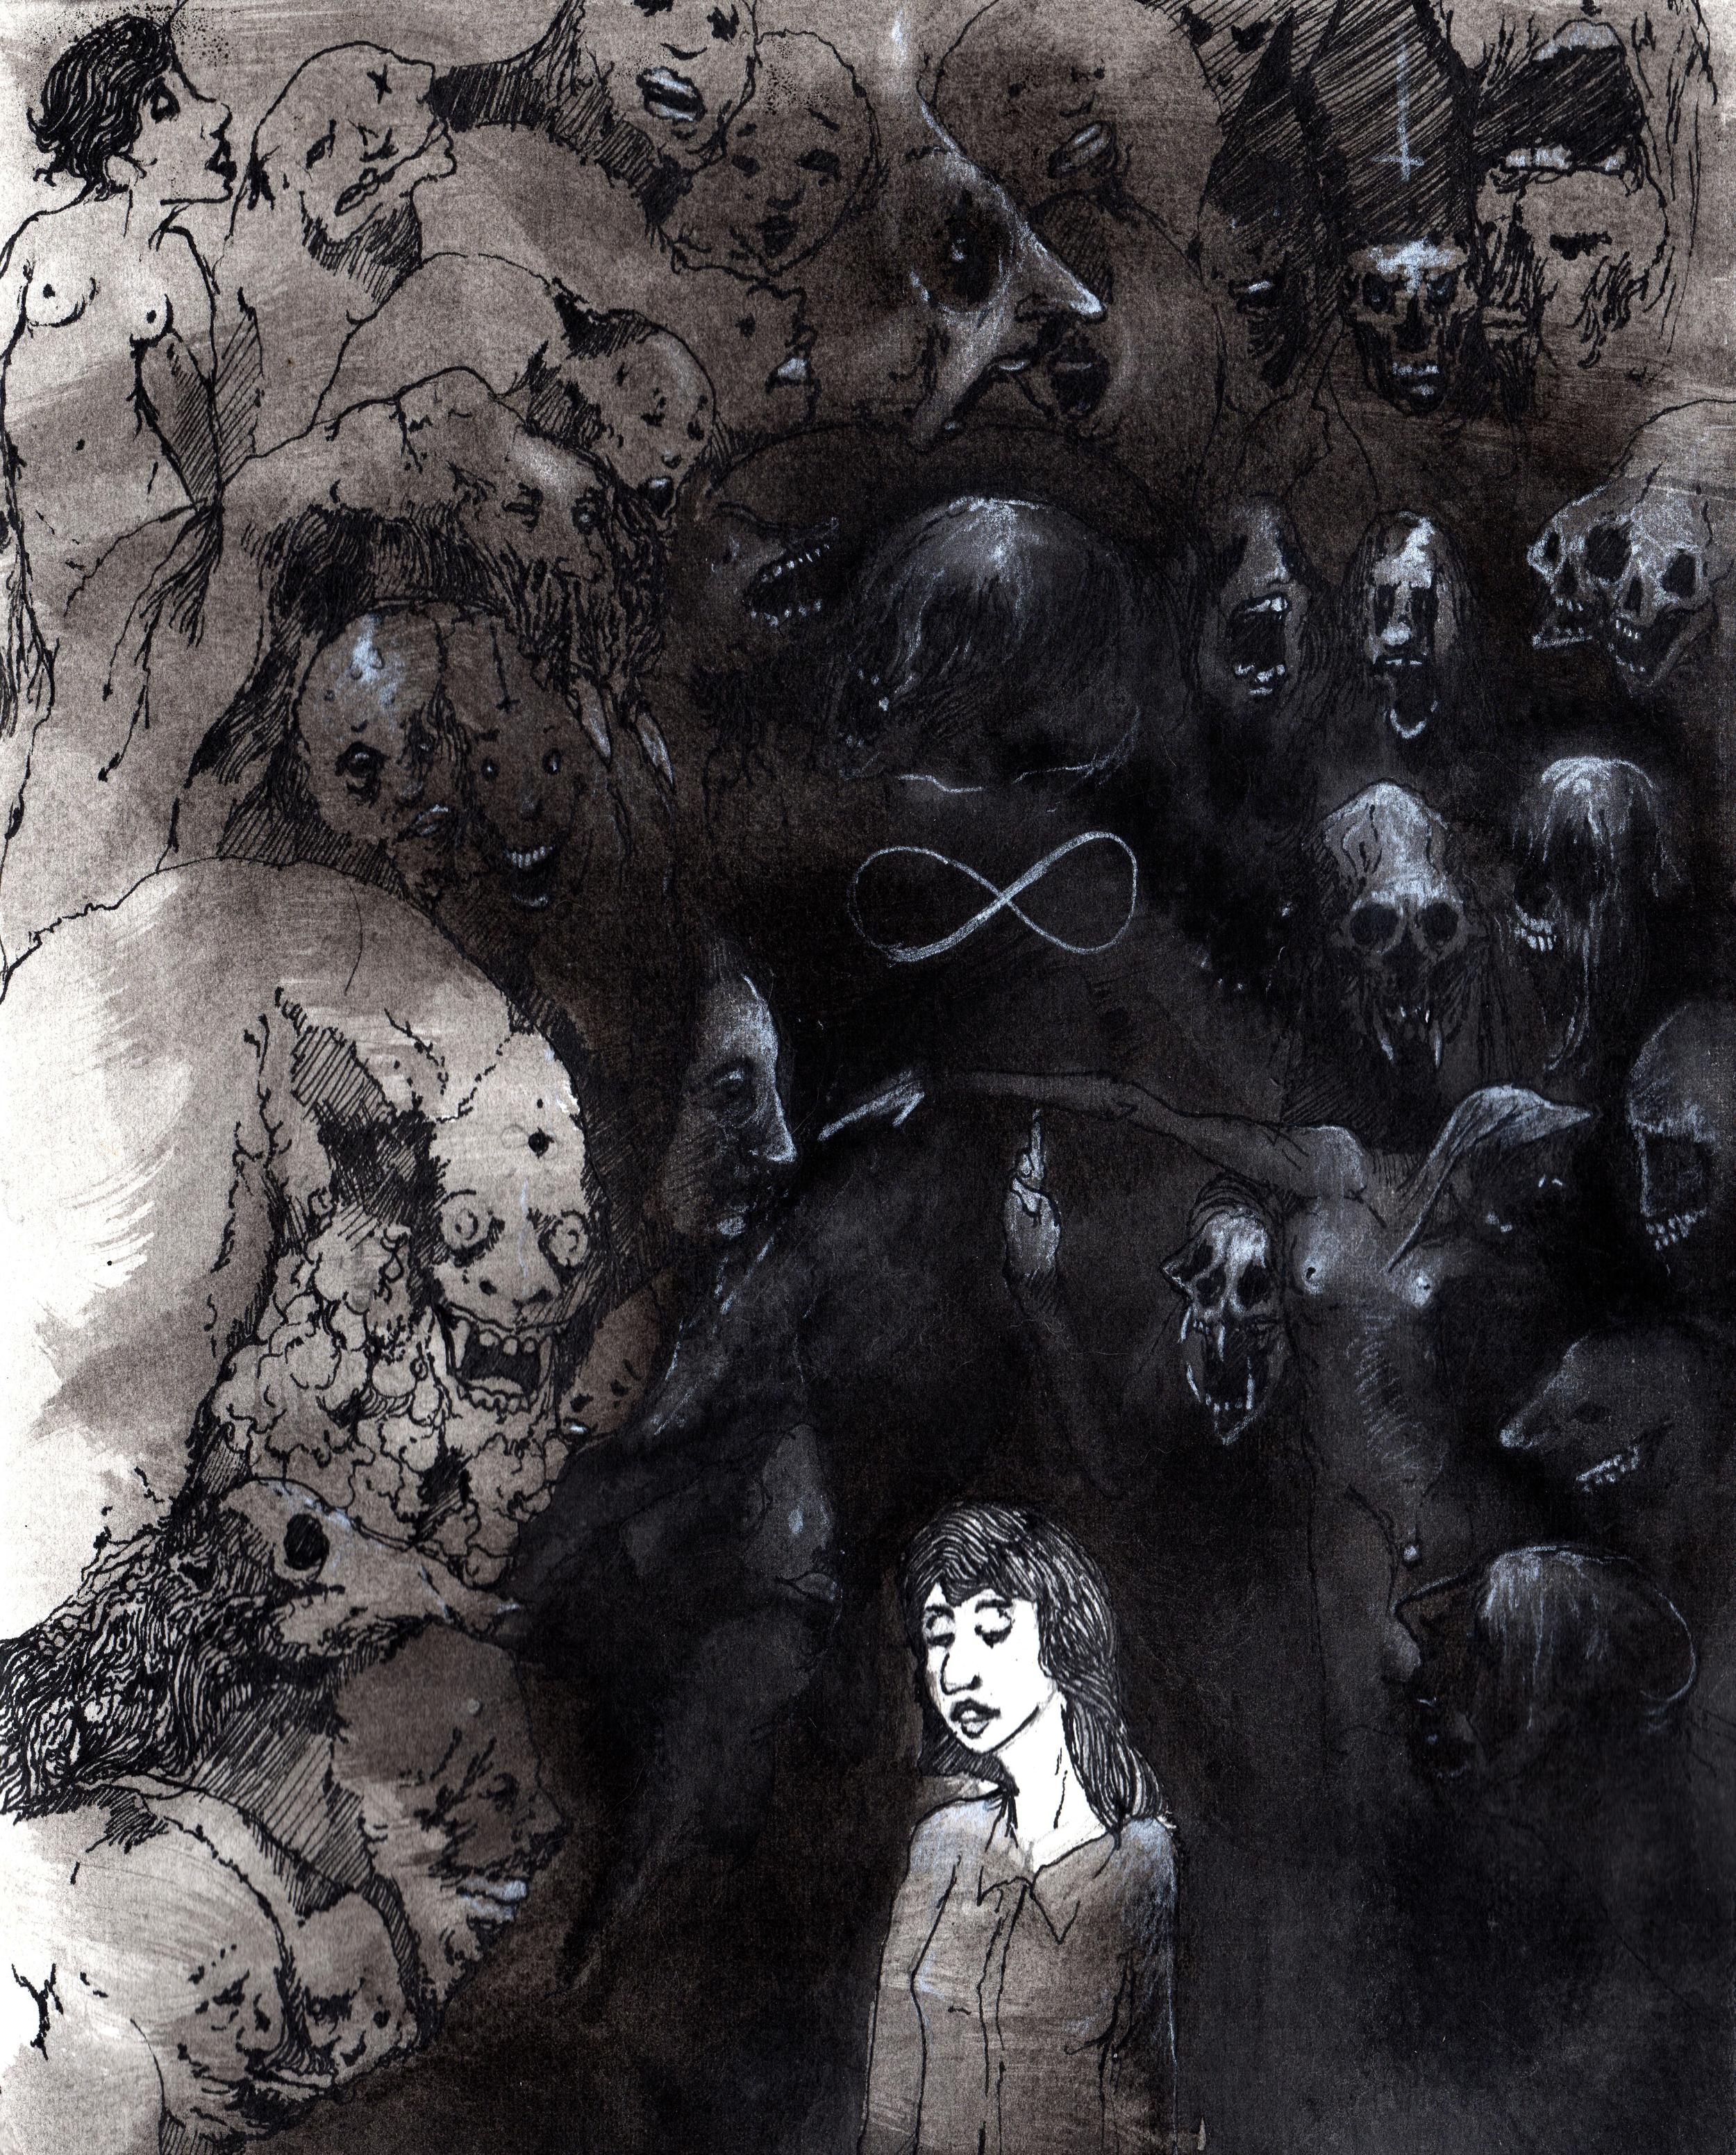 Bone White Glory  . 2013. 9 x 12 inches. Ink wash on paper.